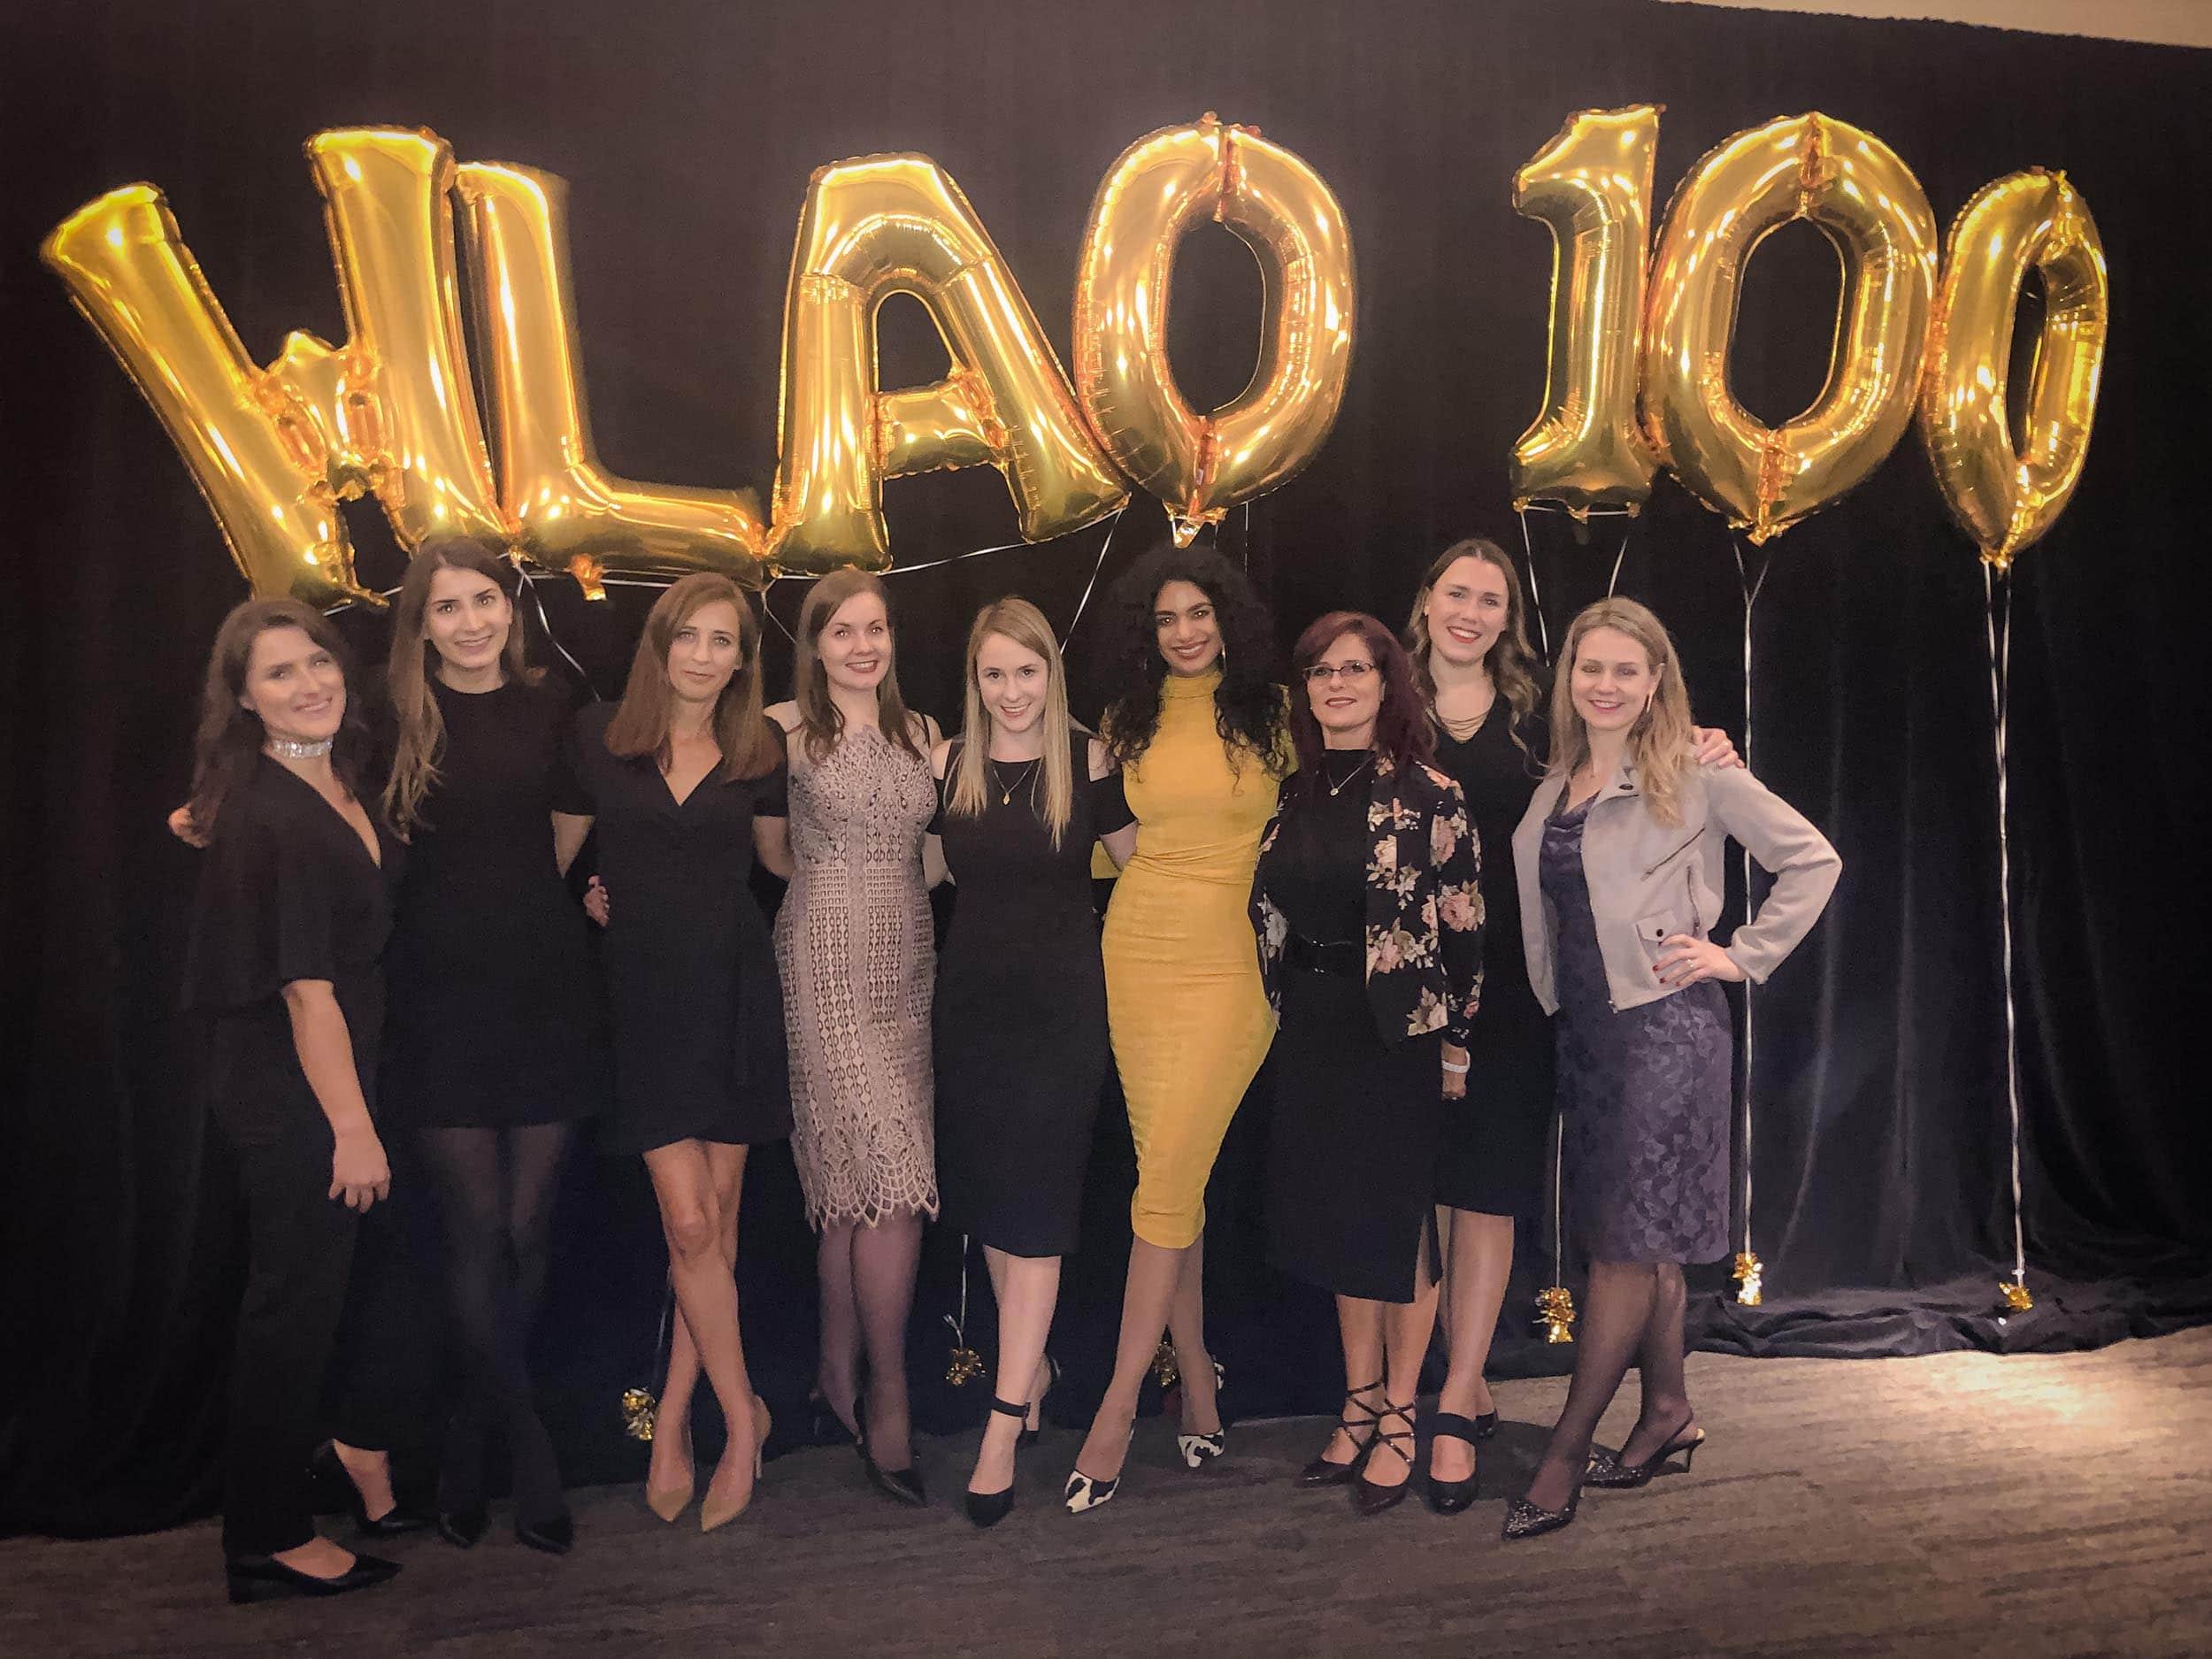 WLAO 100th Anniversary